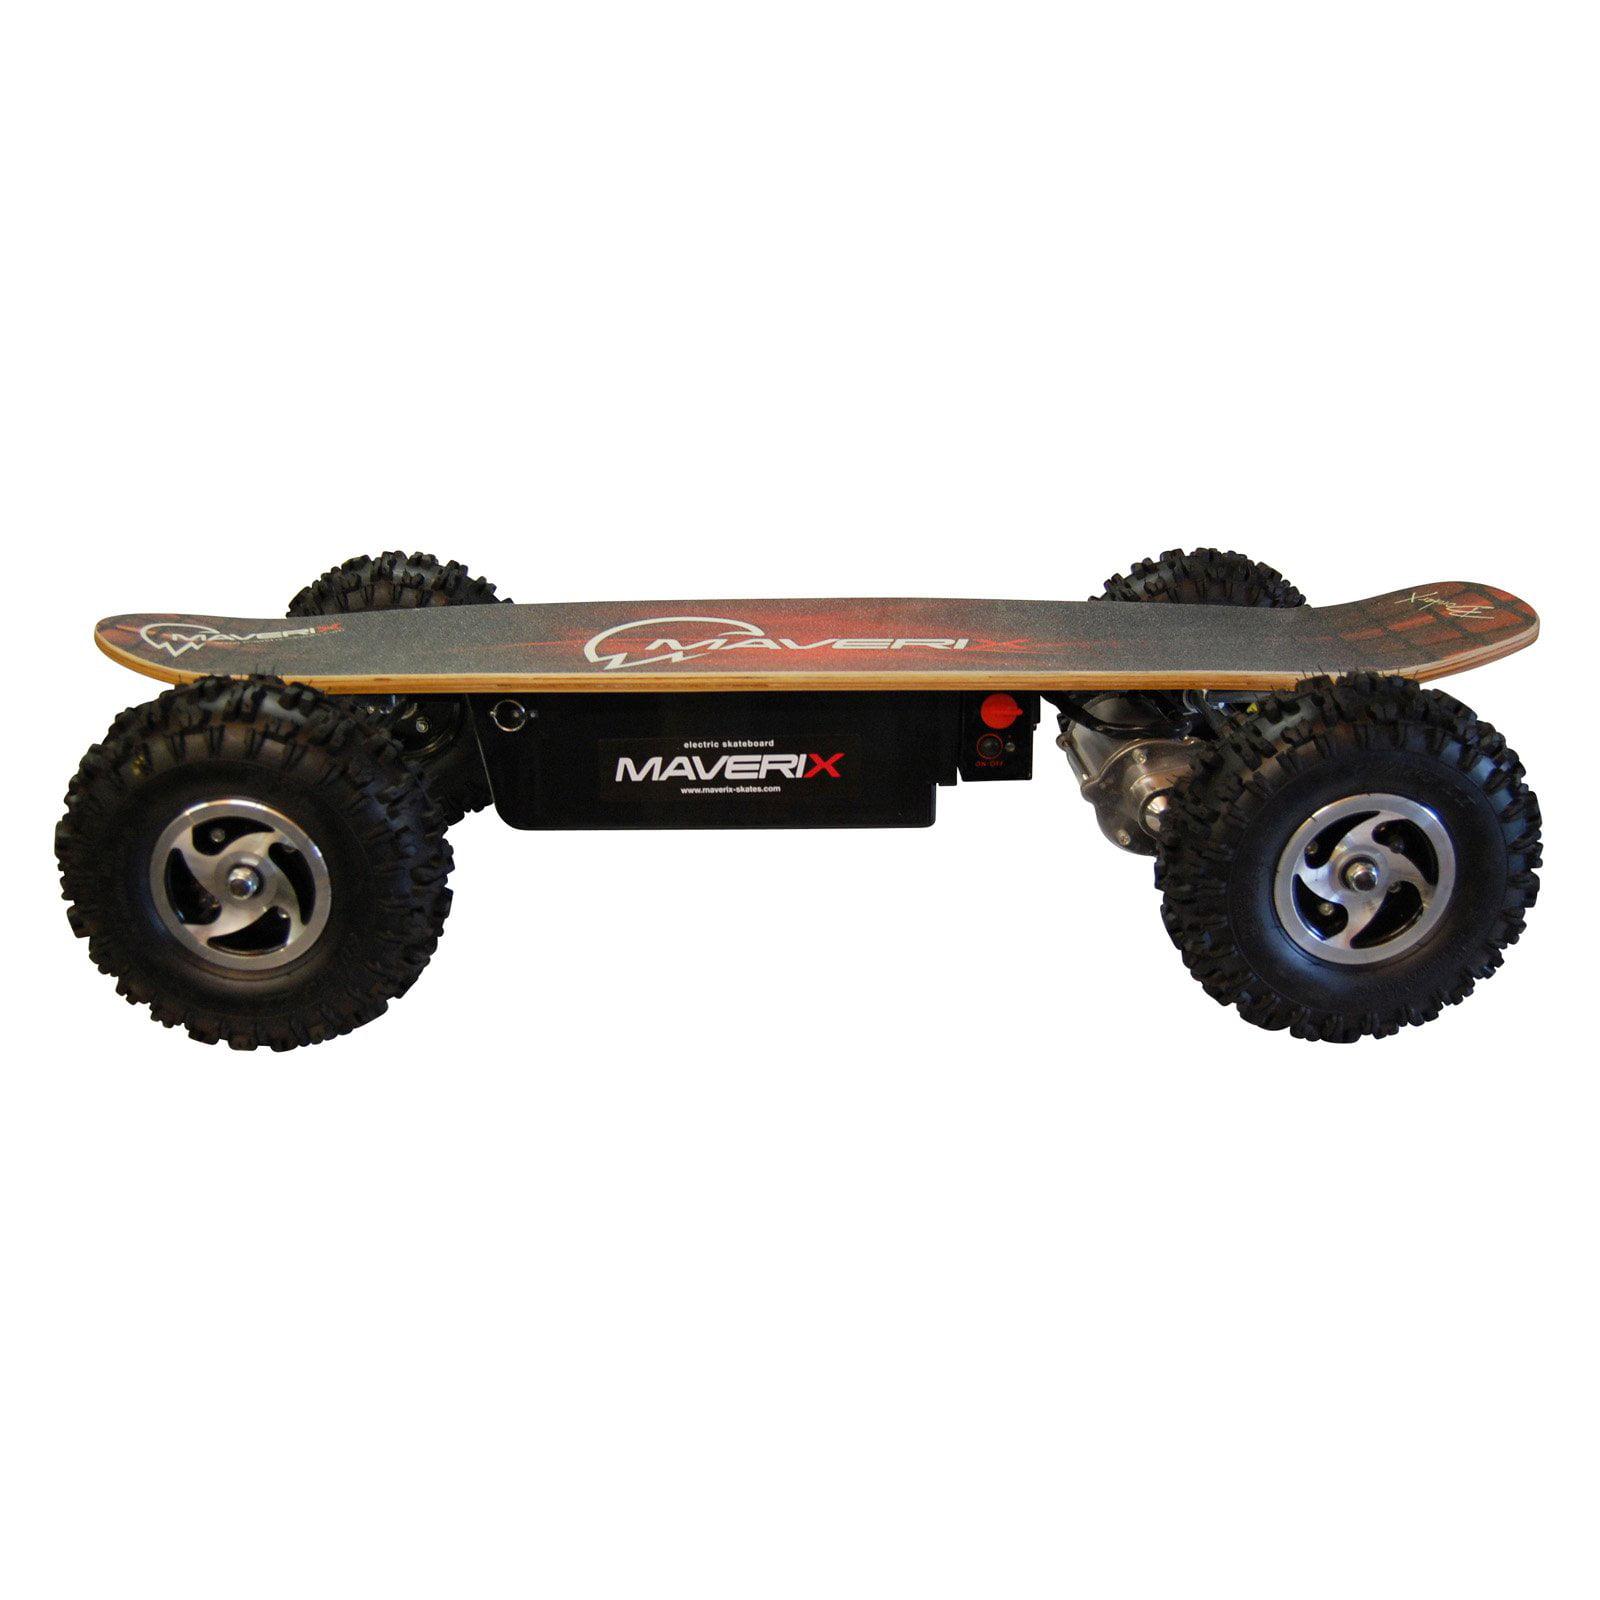 Maverix USA Border Cross Electric Skateboard by Maverix USA, LLC